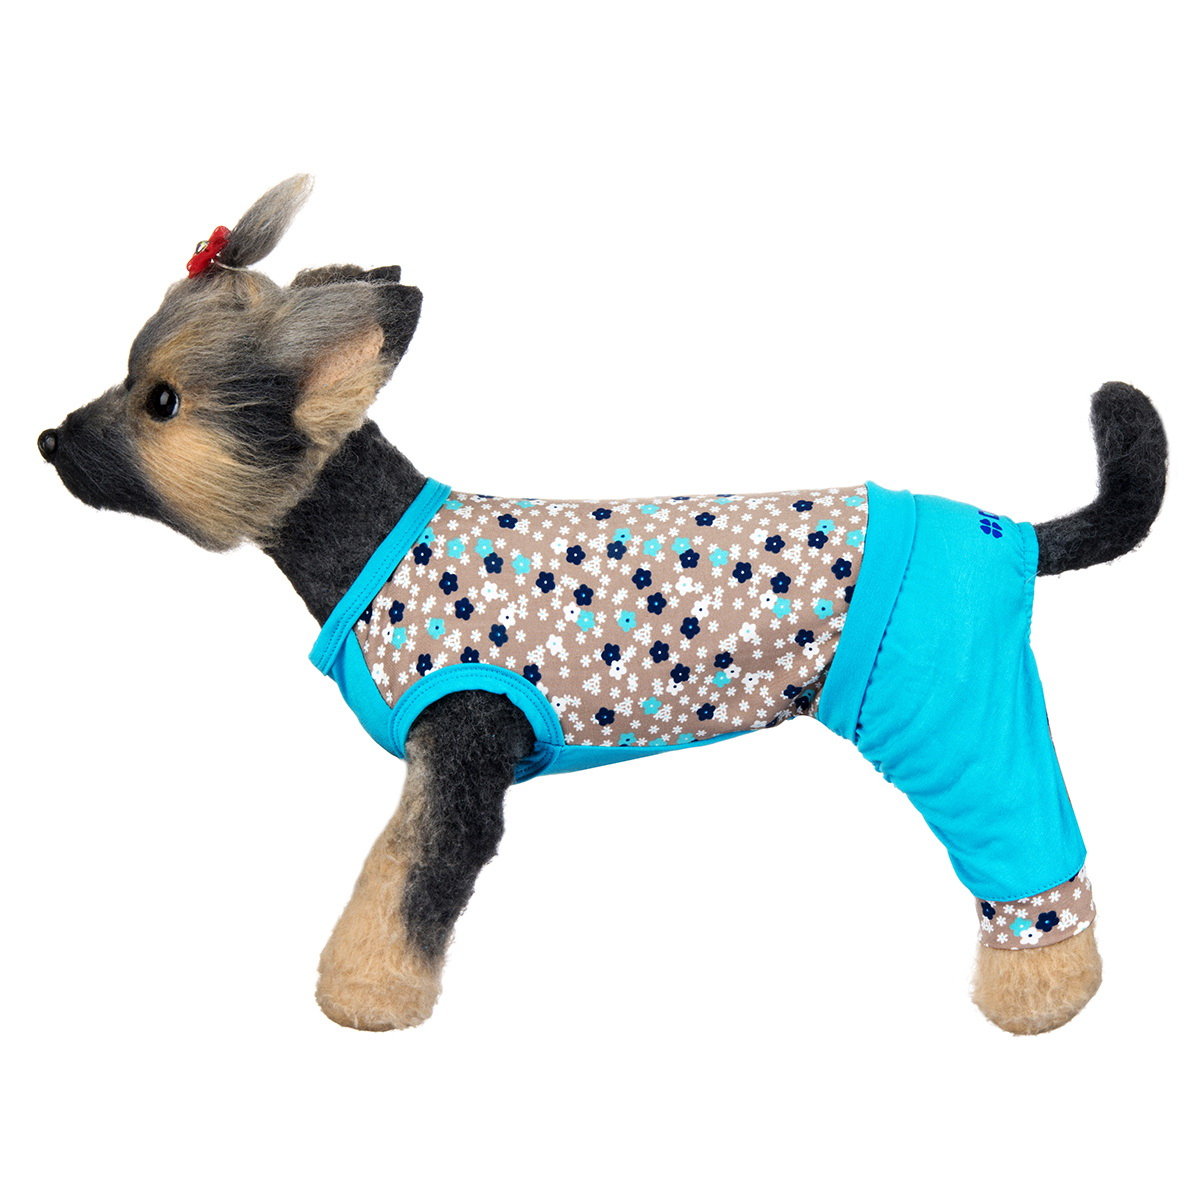 "Комбинезон для собак Dogmoda ""Алекс"", унисекс, цвет: голубой, серый. Размер 3 (L)"